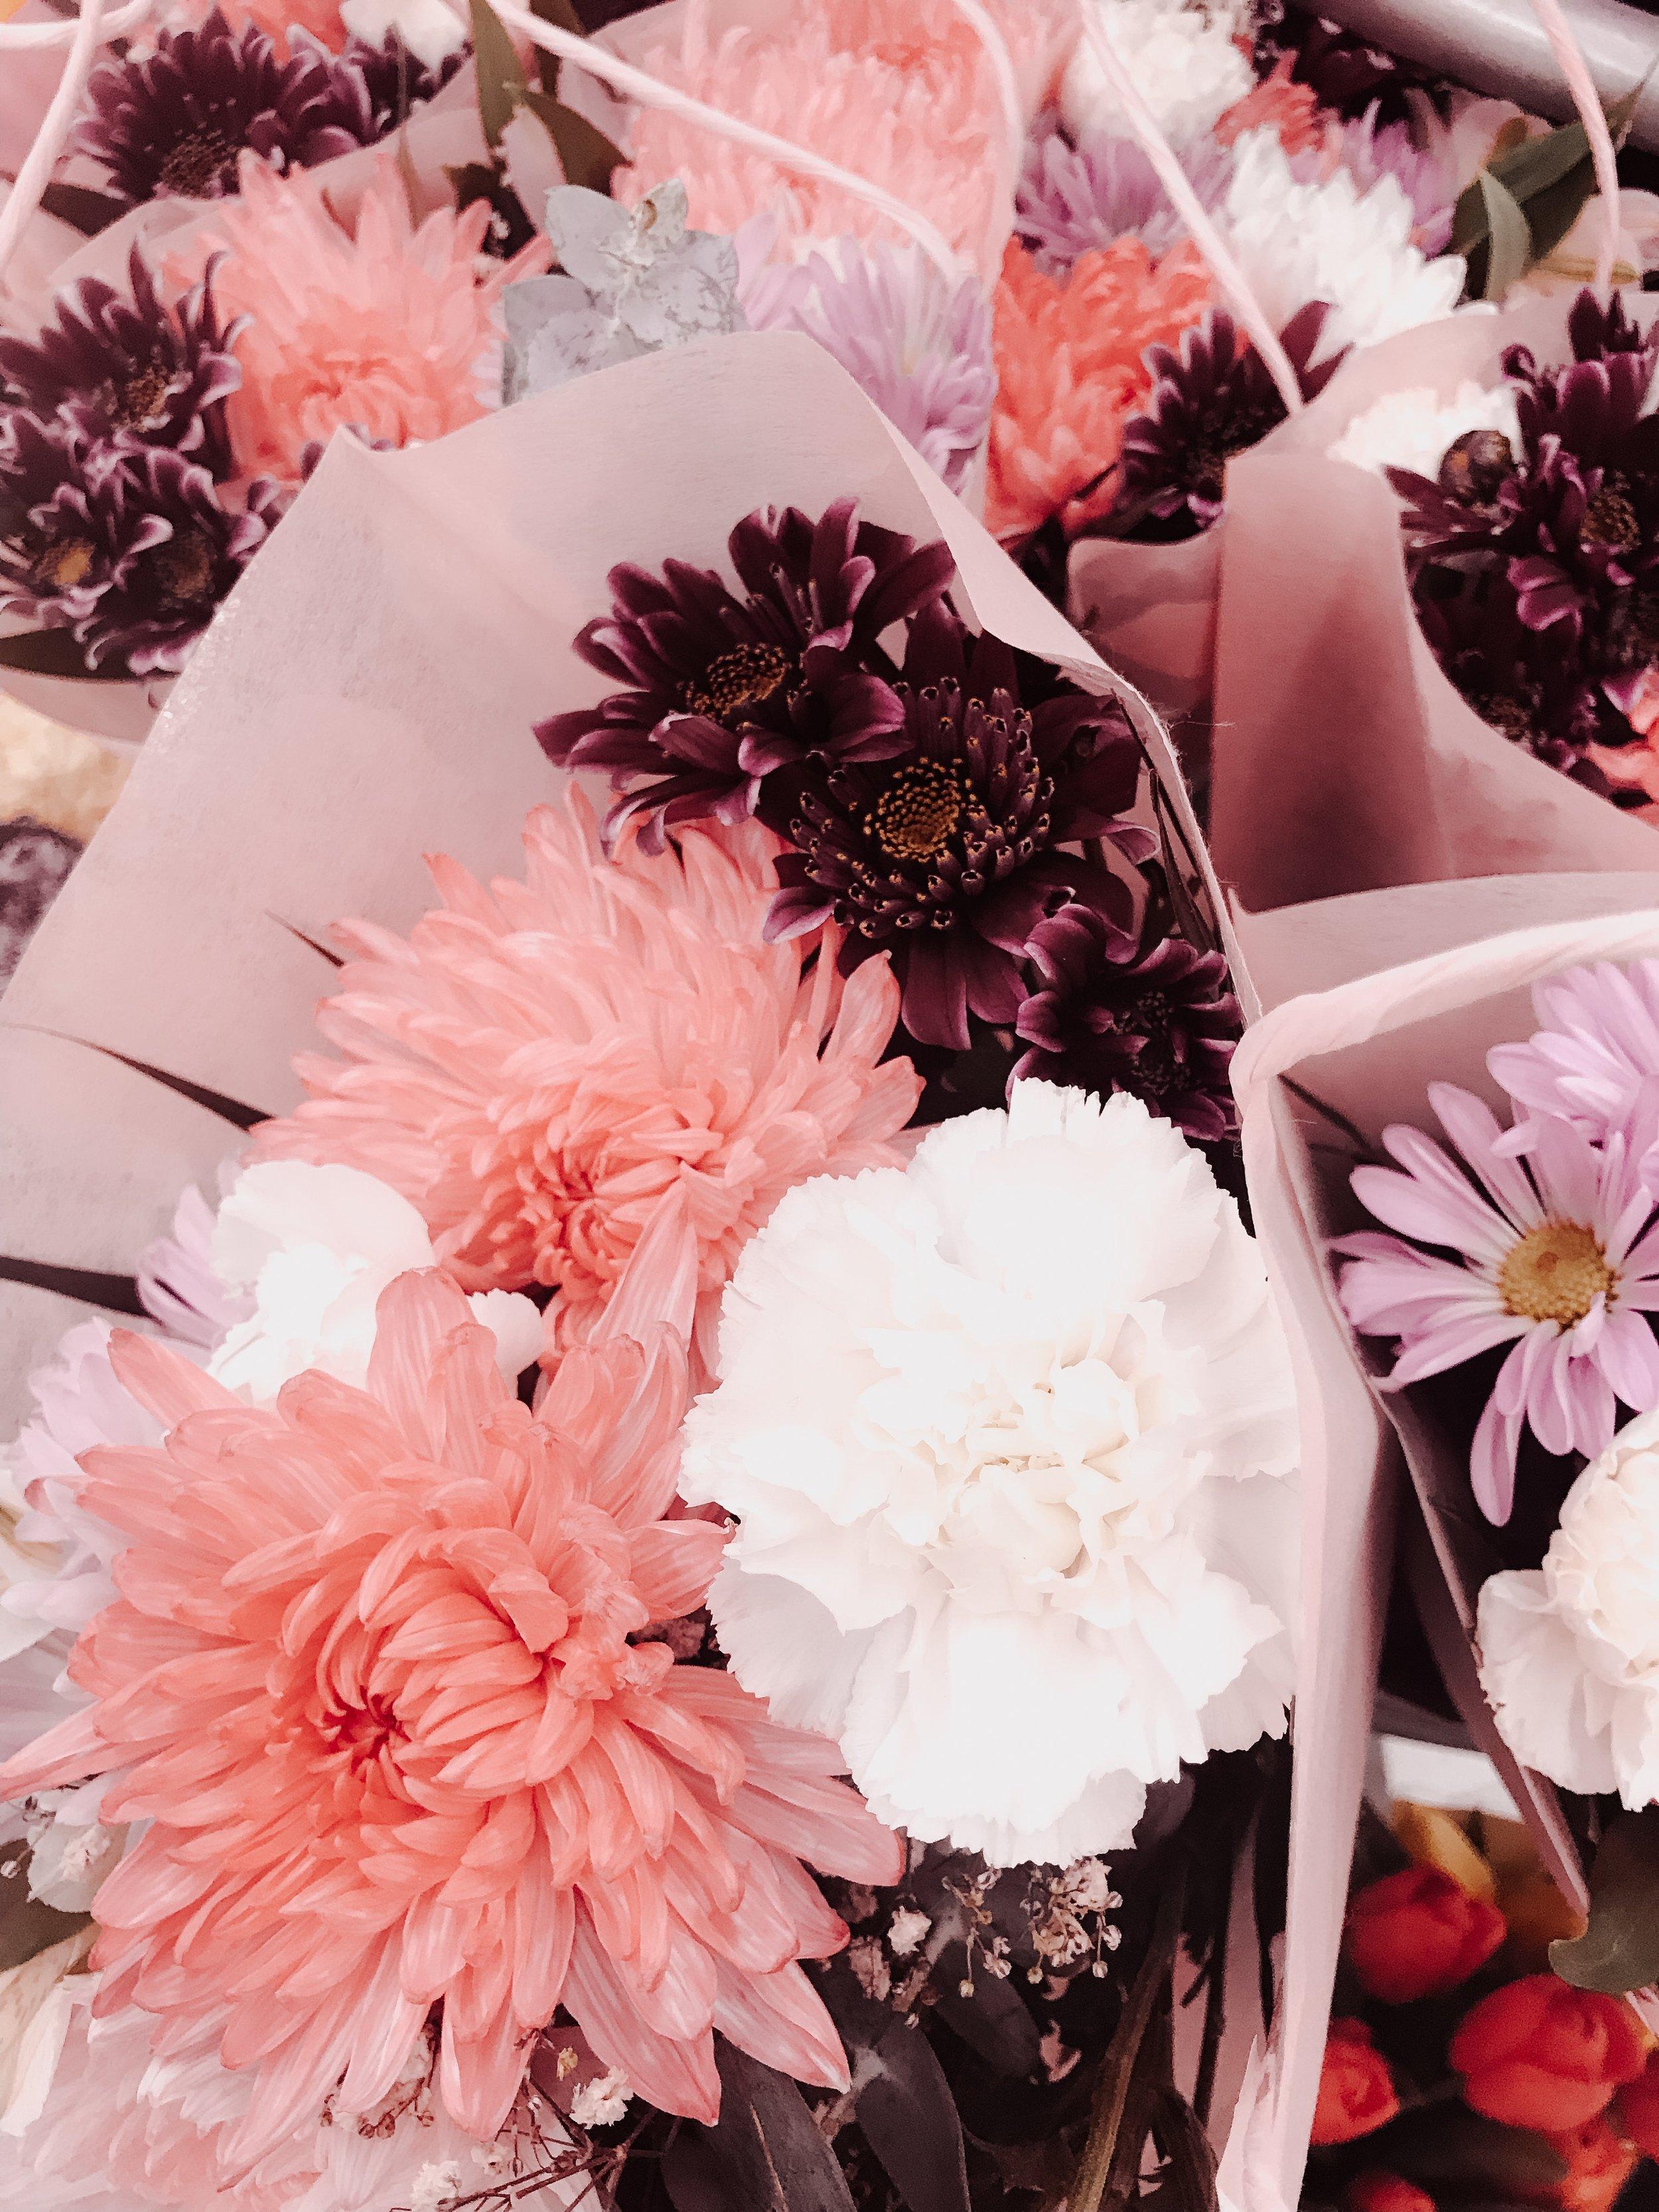 april flowers 3.jpeg